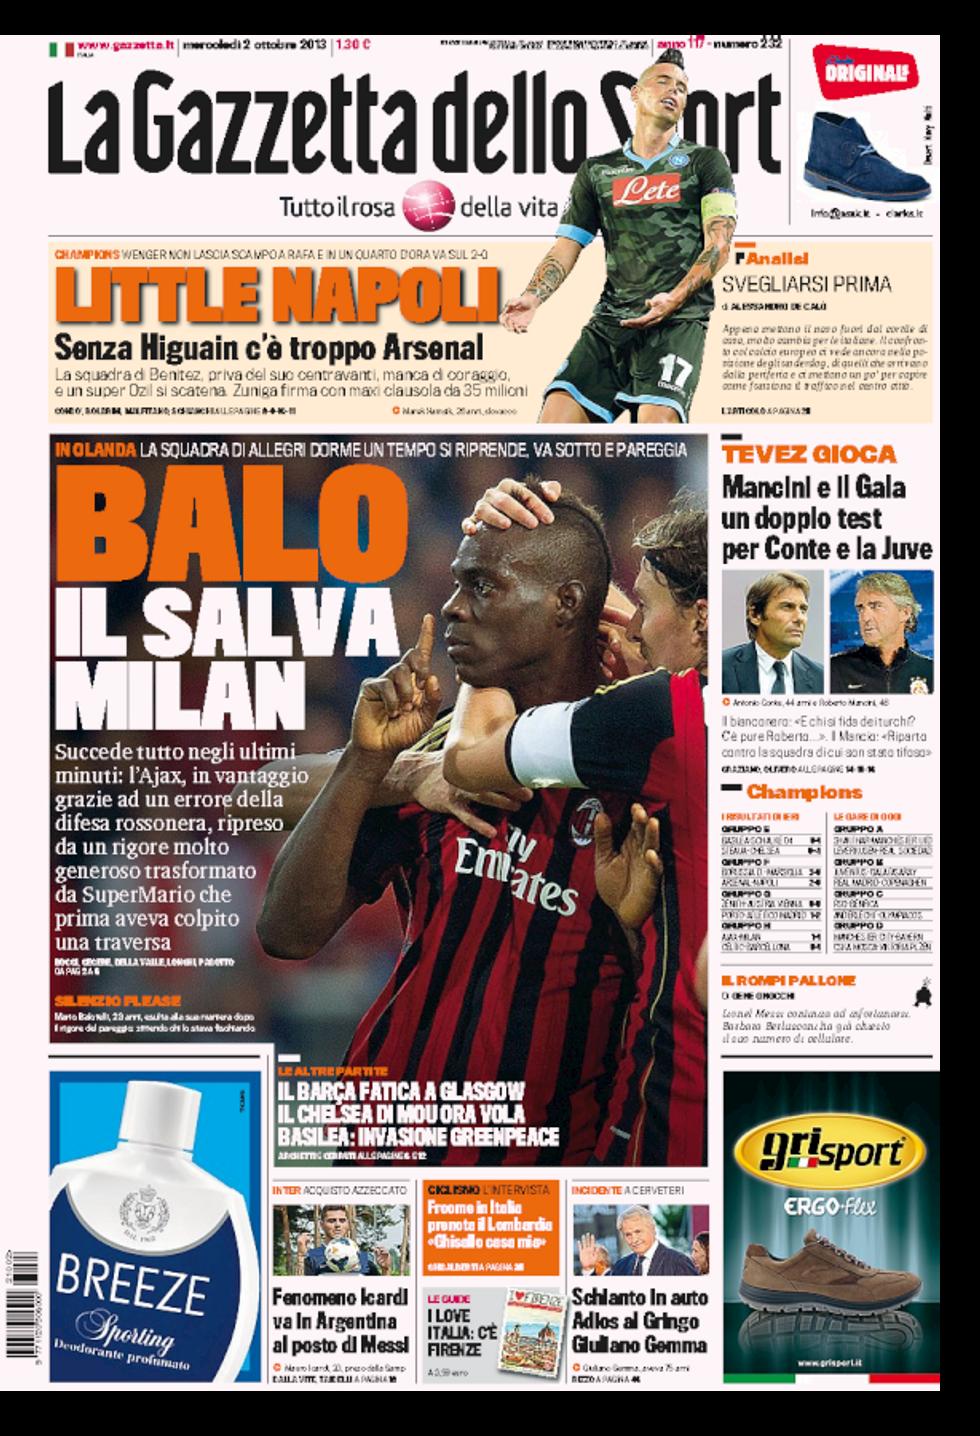 RASSEGNA - Balo salva Milan e il Napoli k.o.